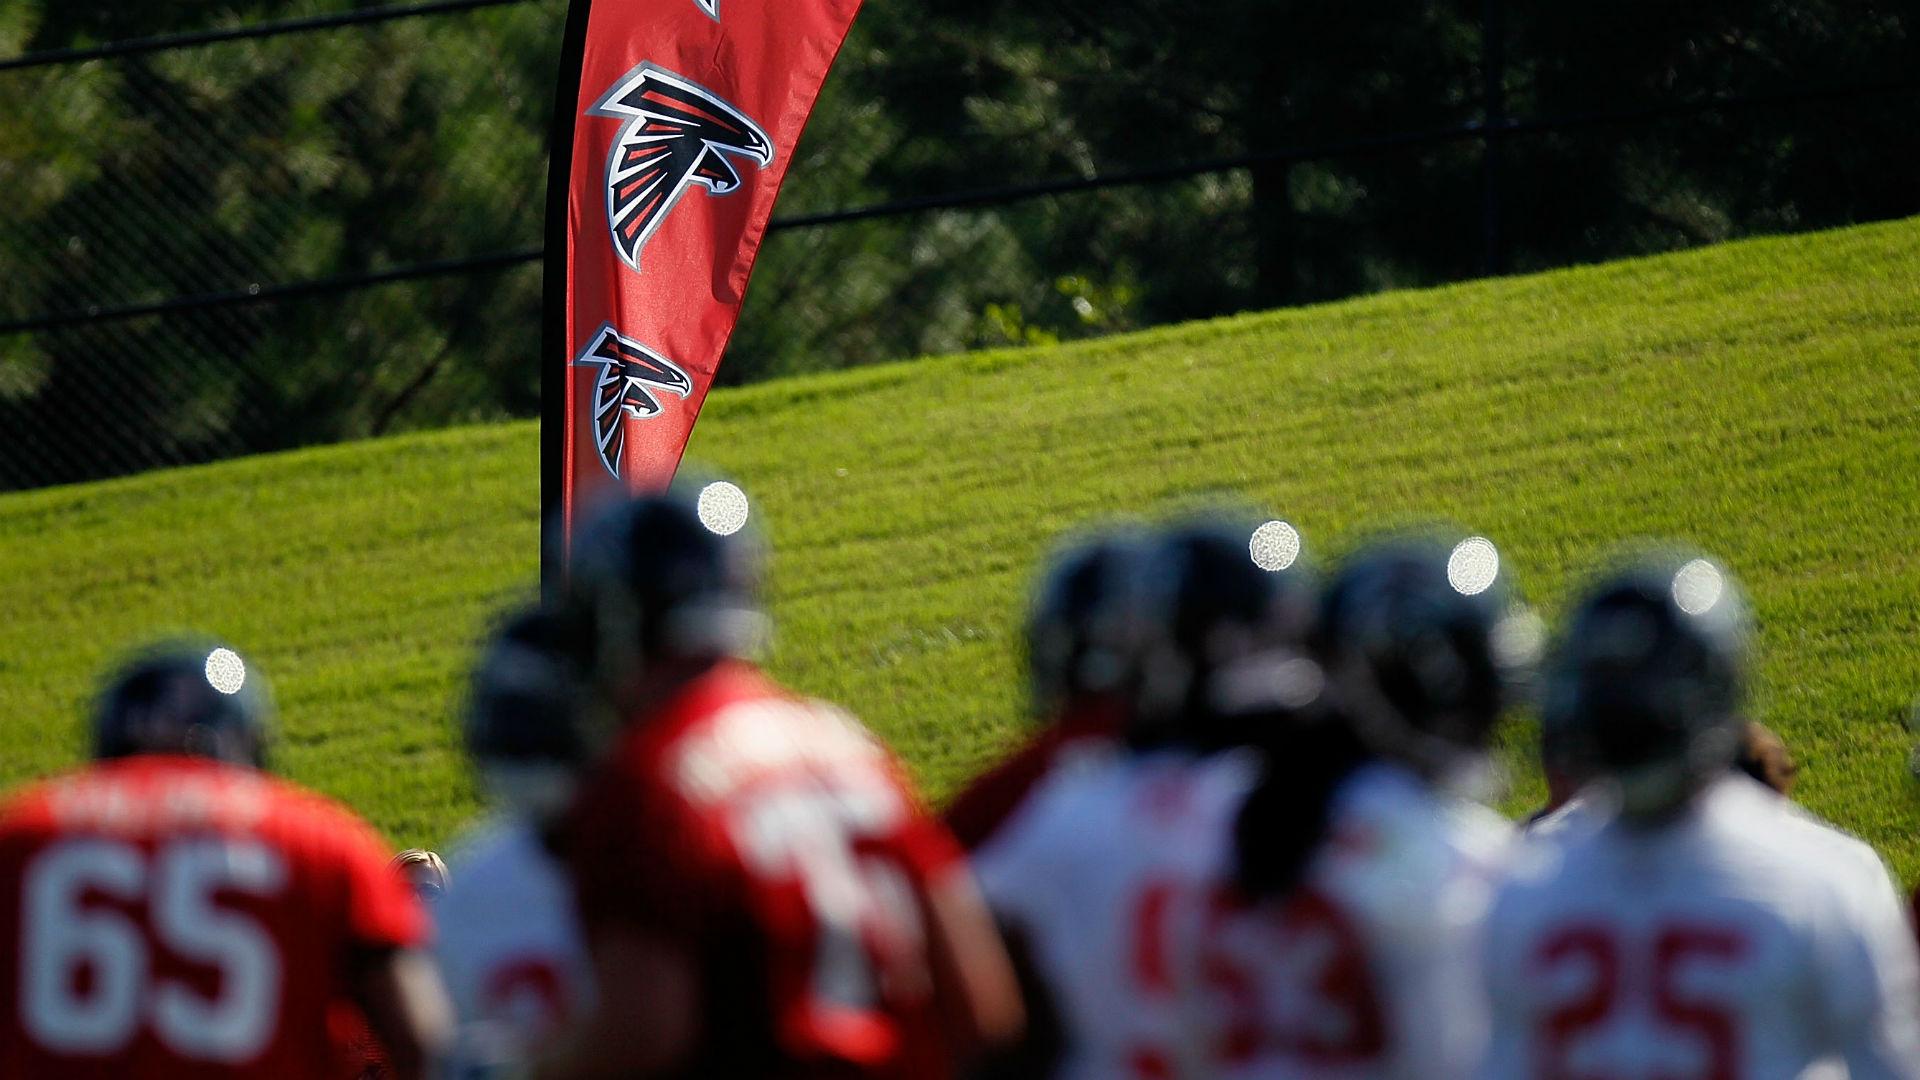 NFL practice squads: Minimum salary, rules for 2018